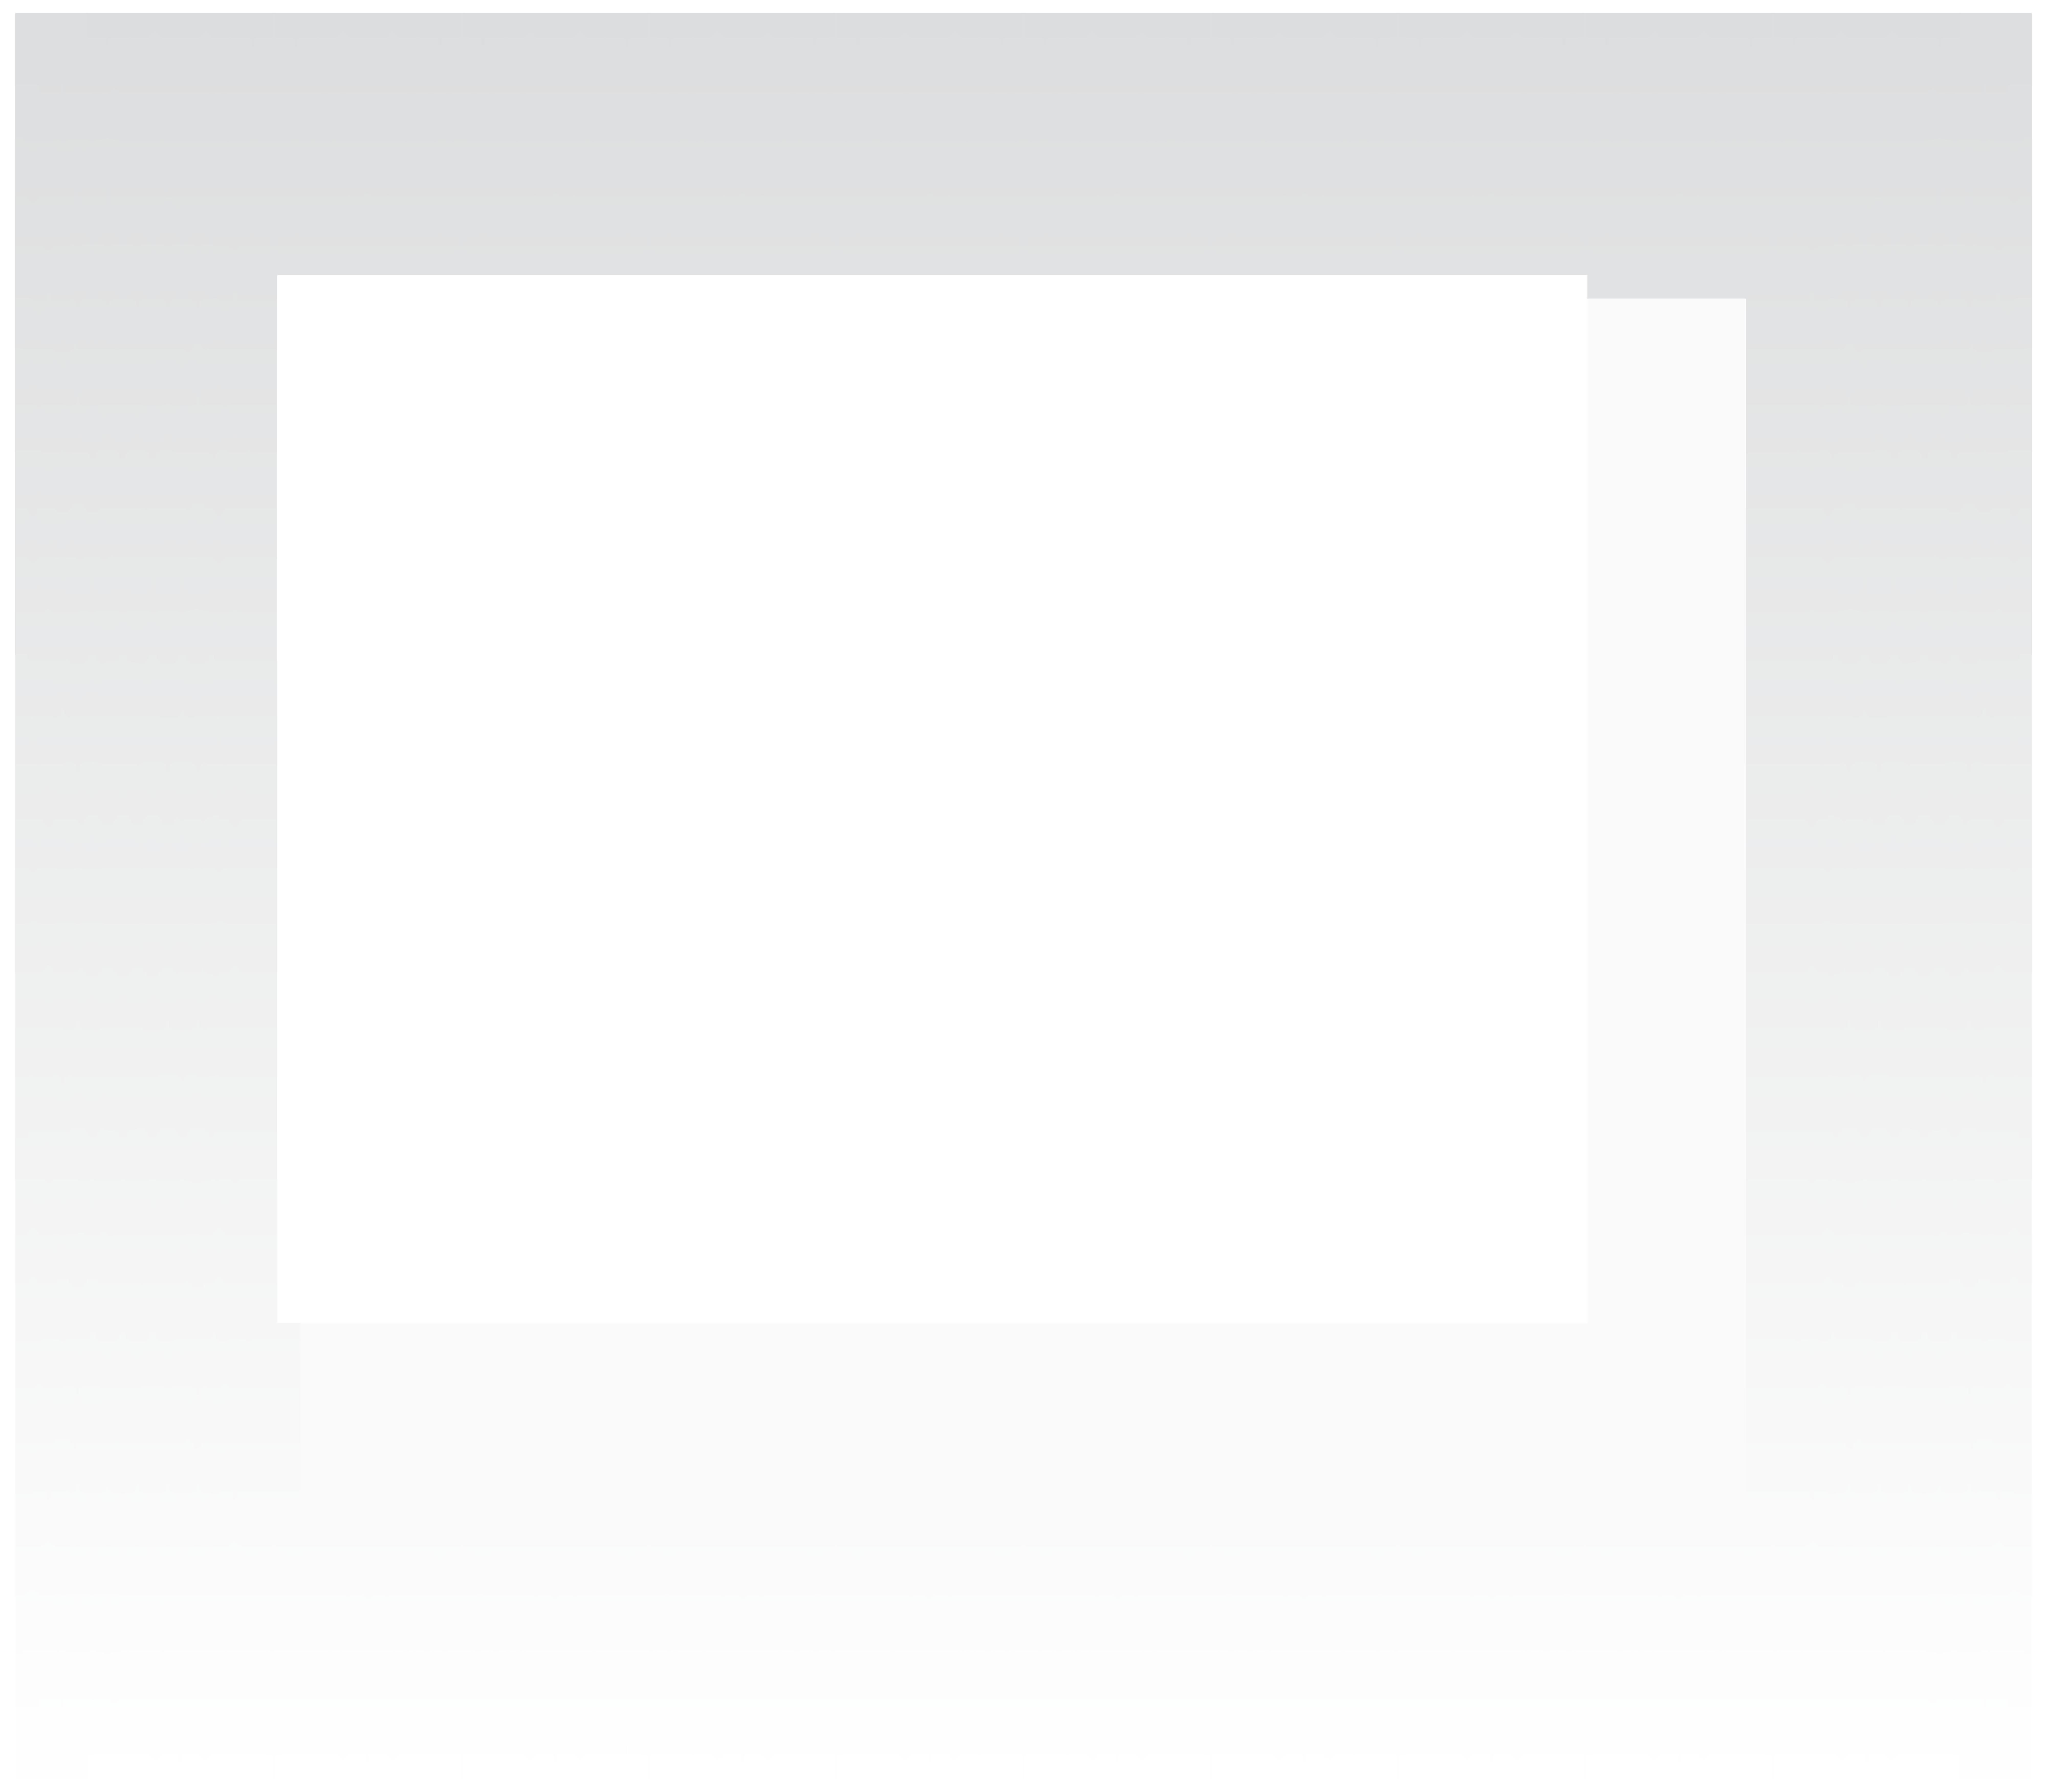 White lace border png. Frame clip art image